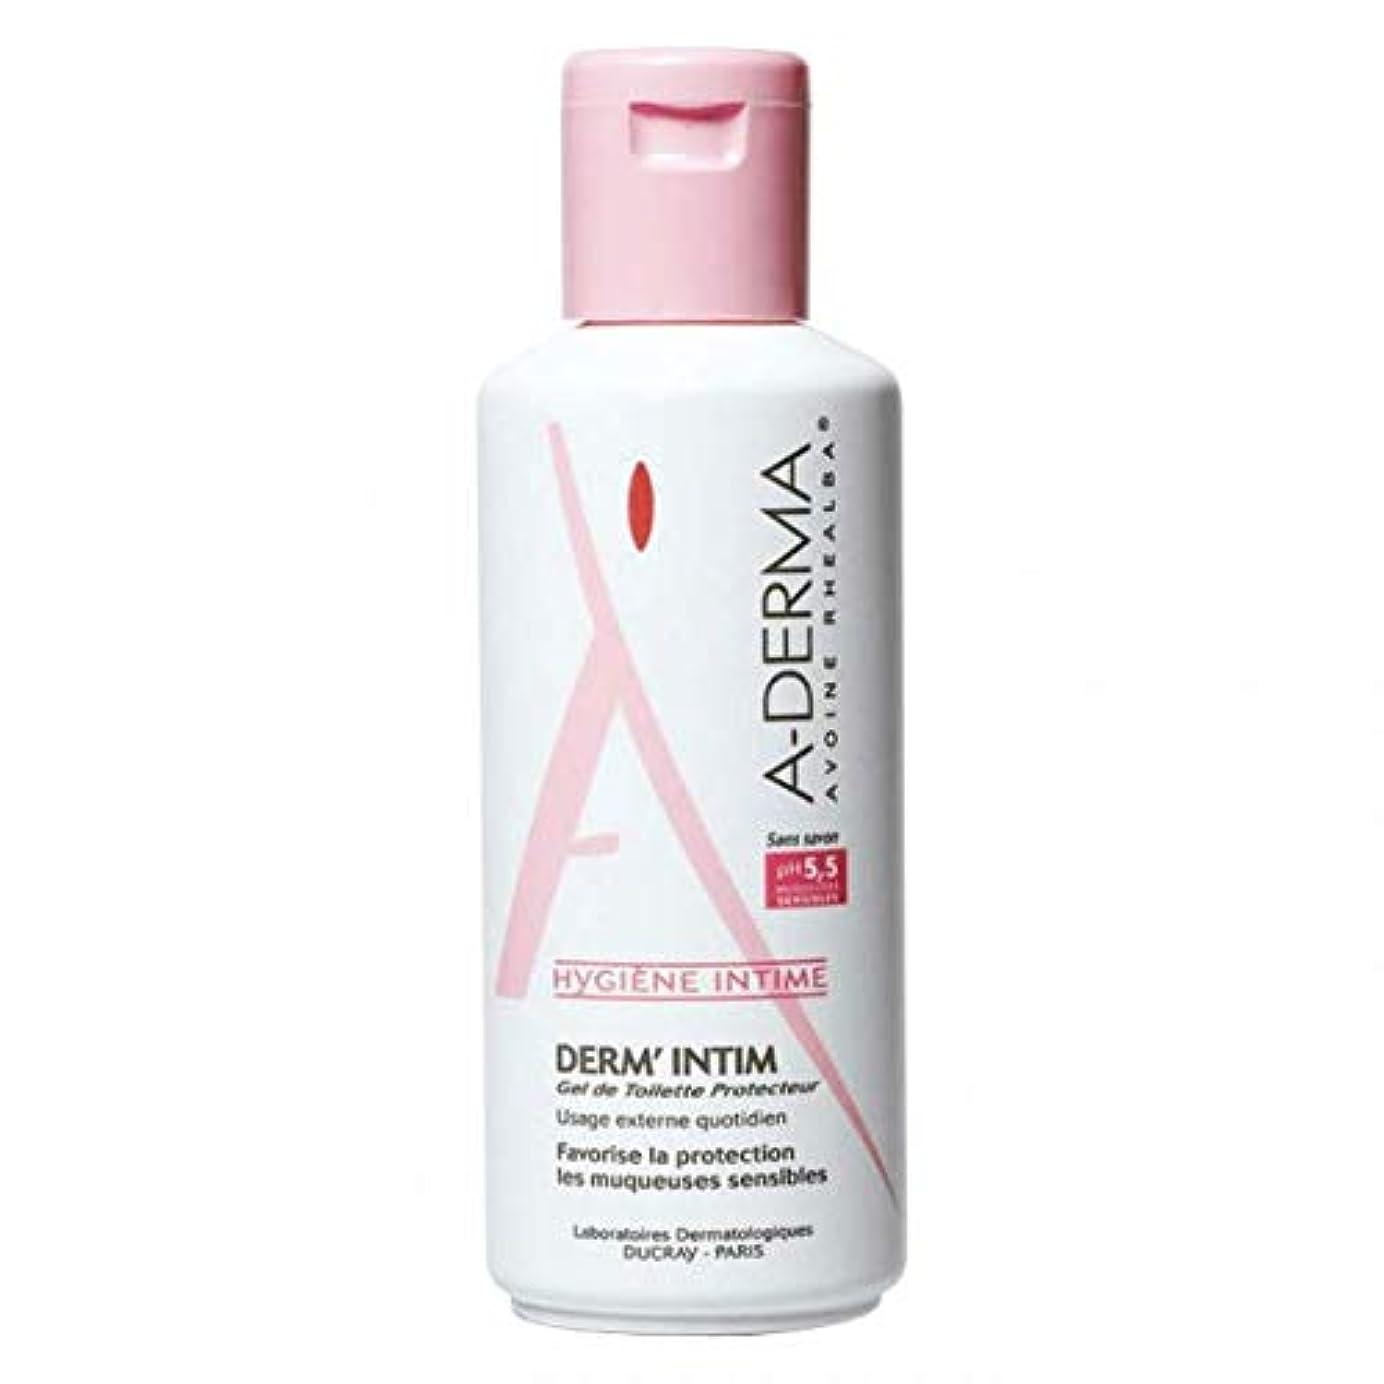 A-derma Dermintim Protective Cleansing Gel Ph 5.5 200ml [並行輸入品]